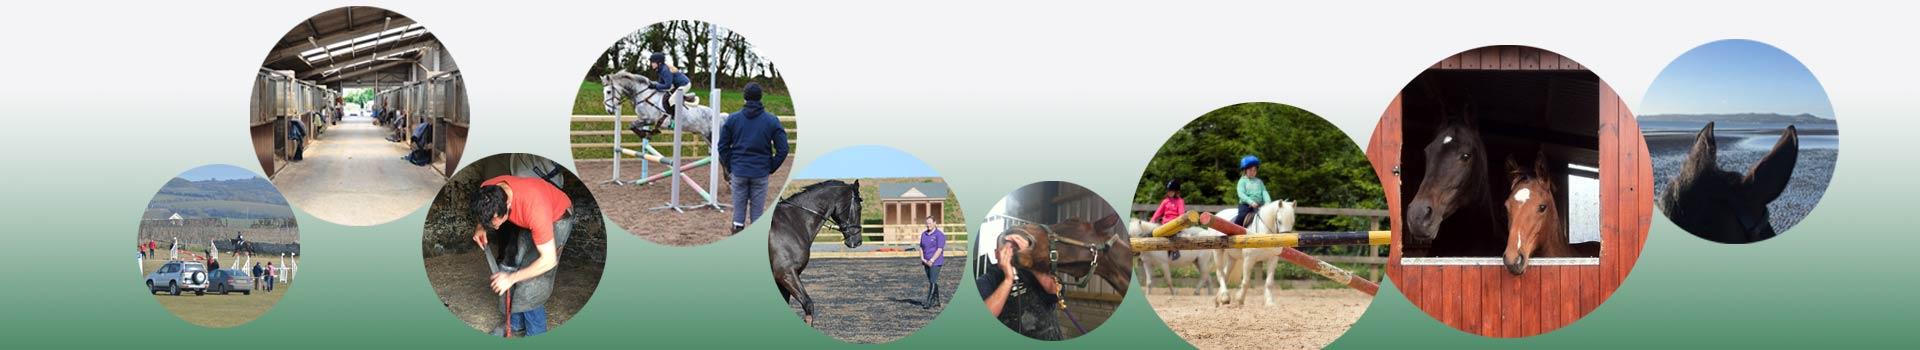 HorsePlay-Directory3